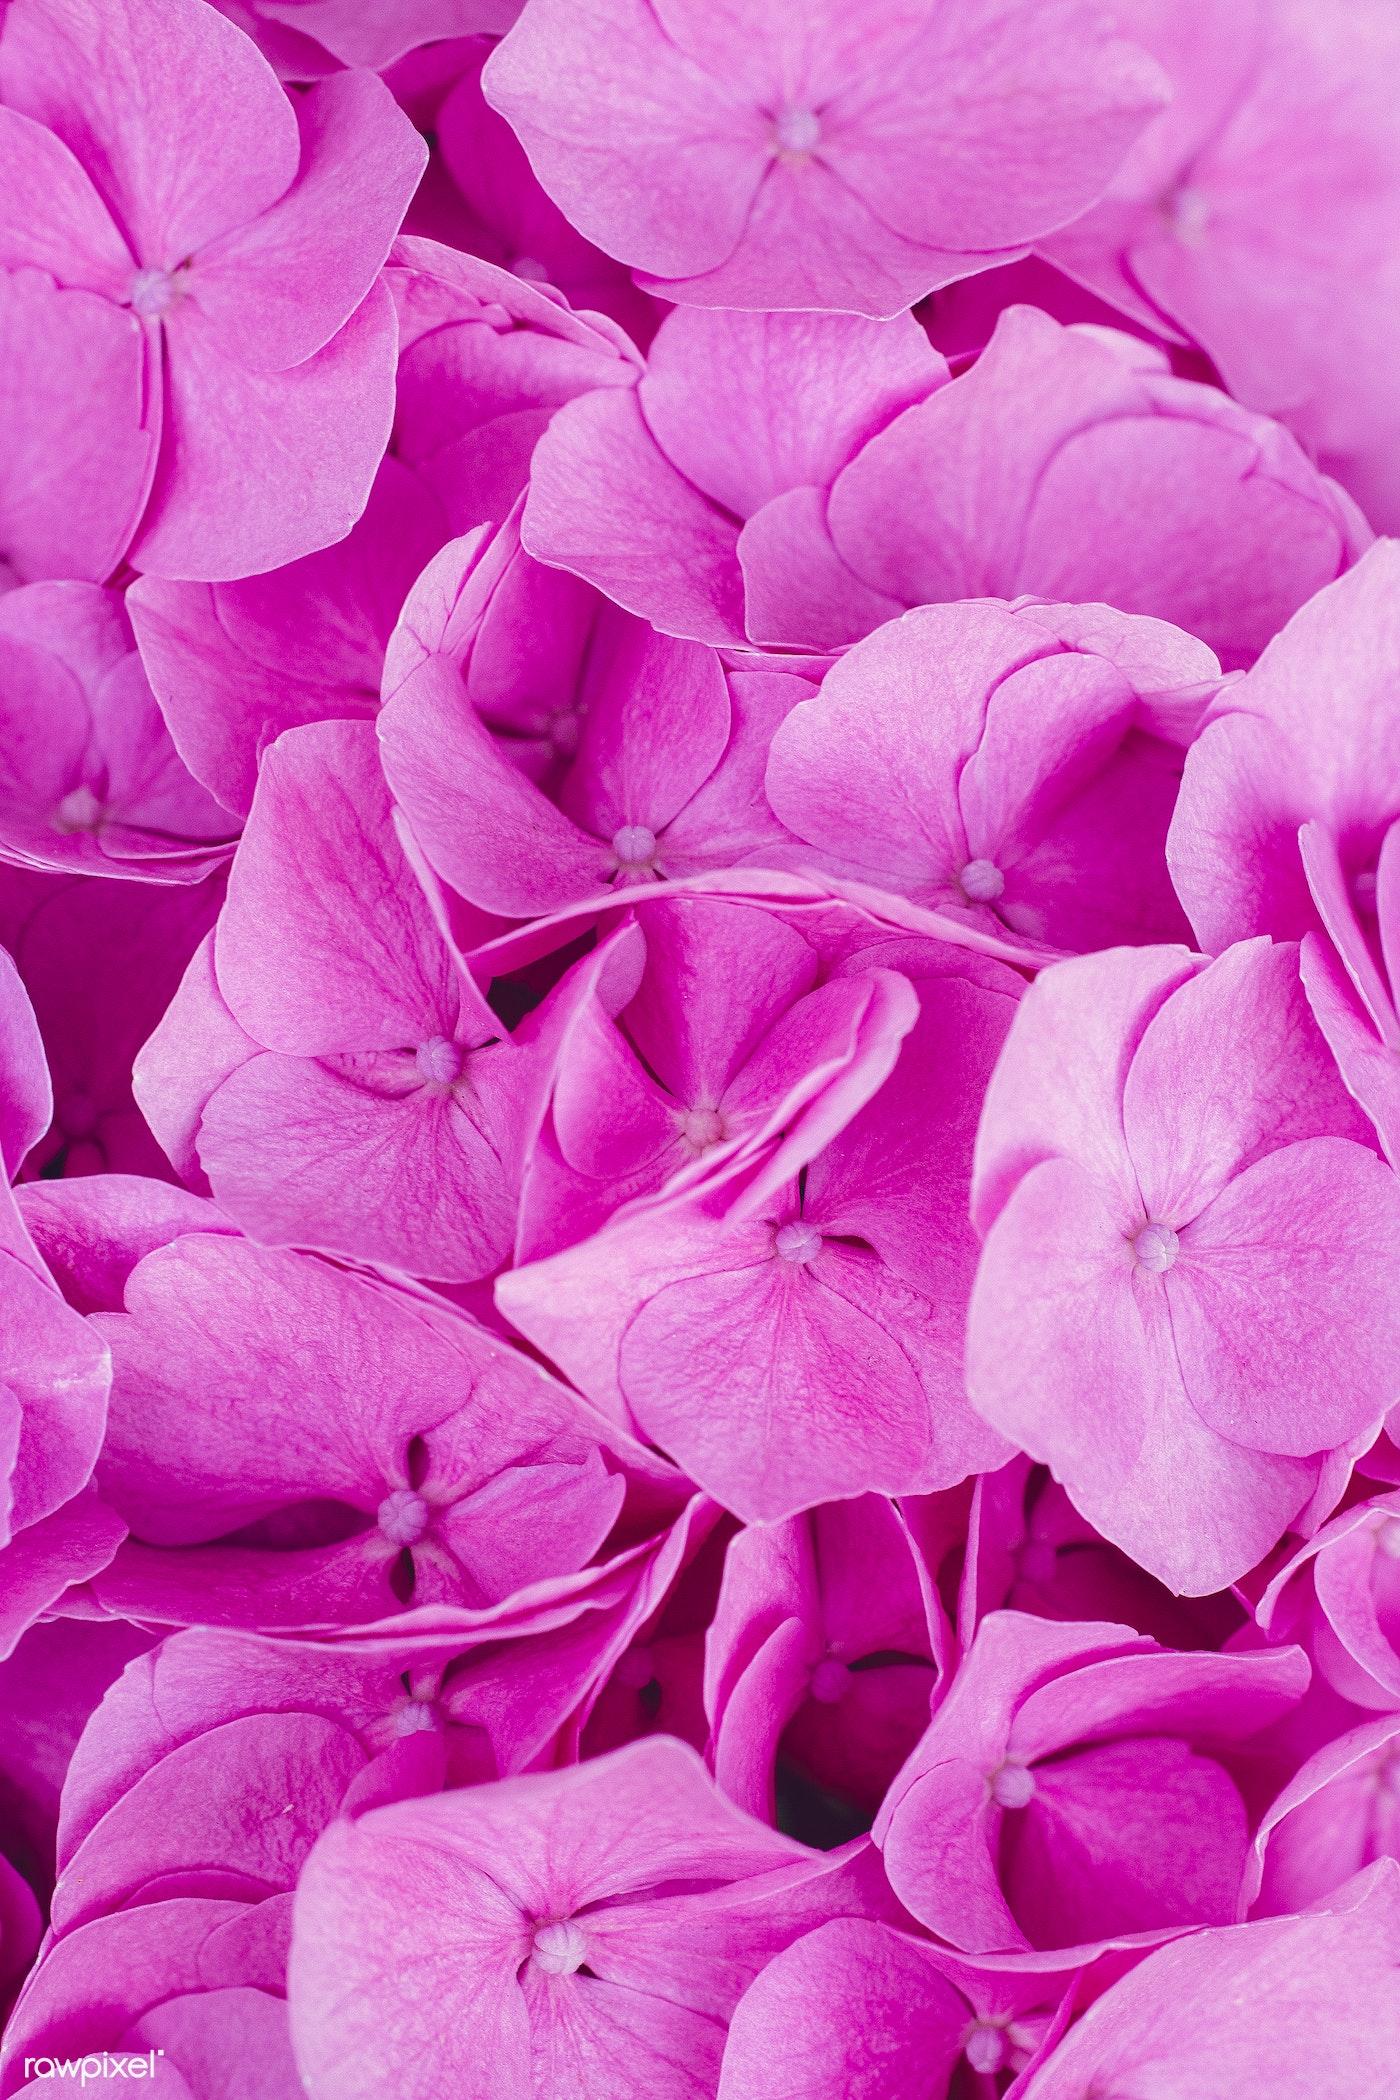 Closeup Of Pink Flowers Textured Wallpaper By Markus Spiske Id 457089